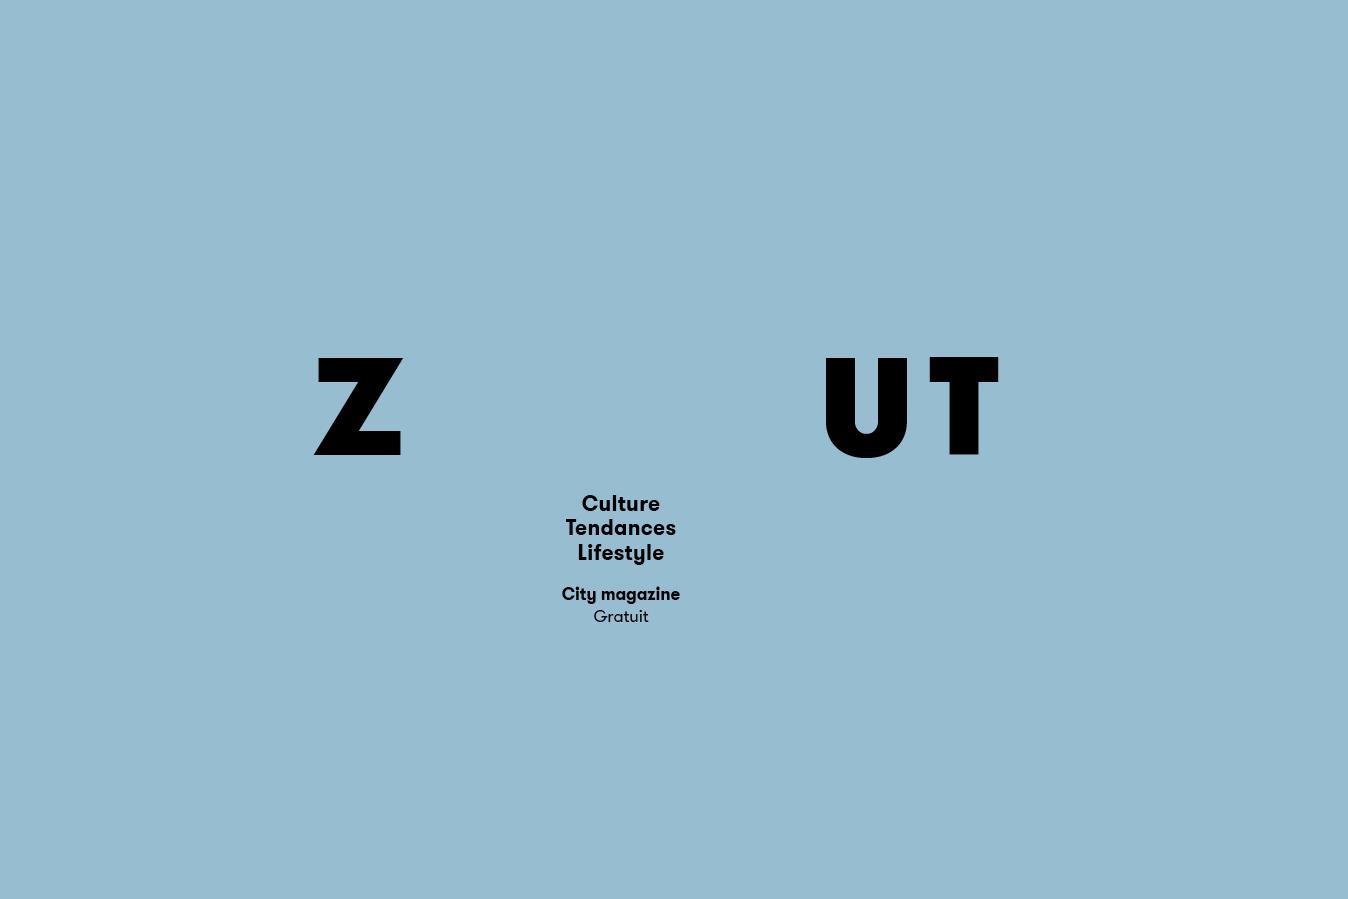 texte_zut-7